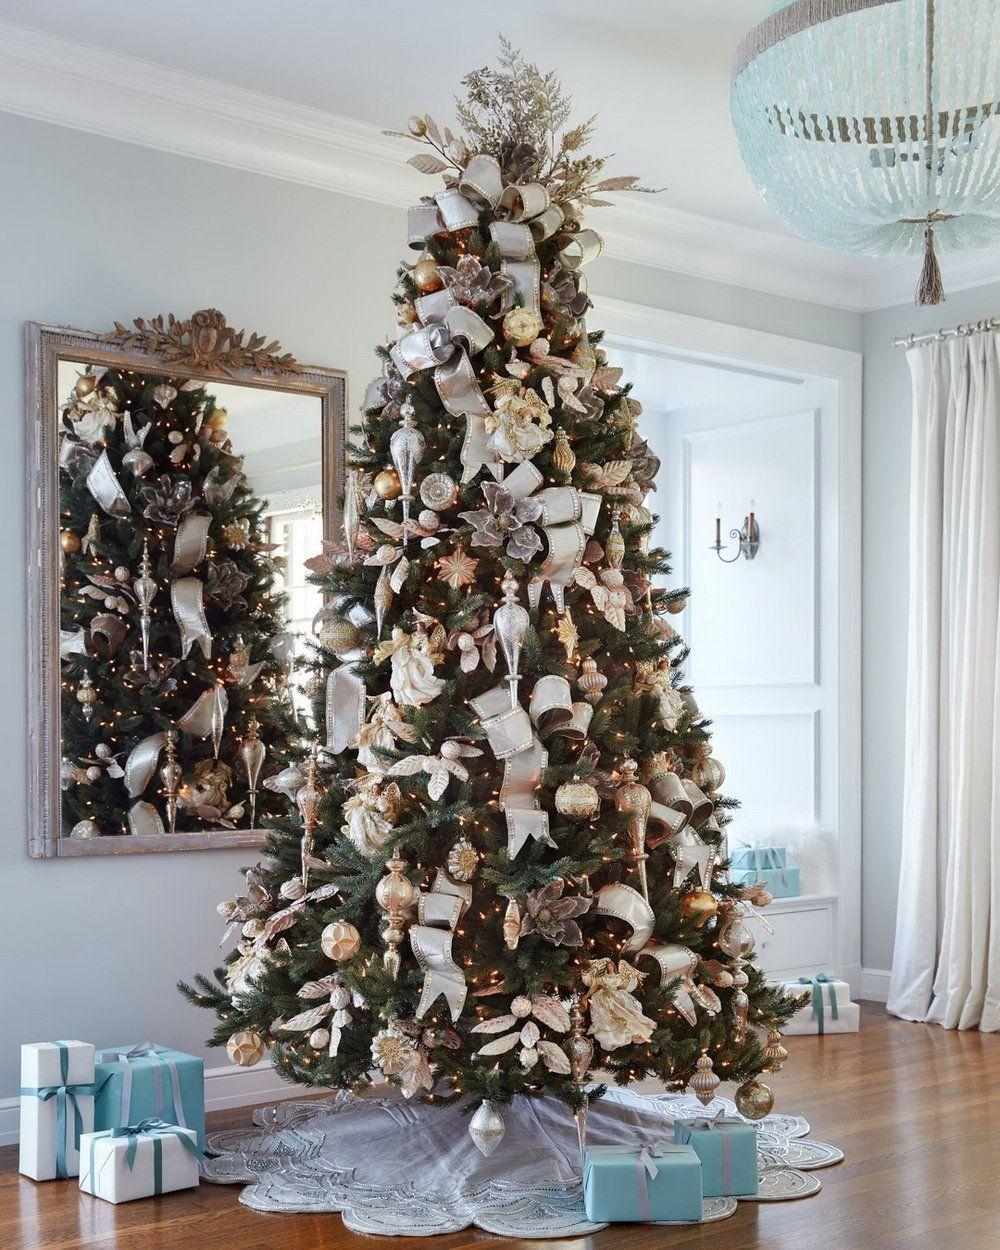 Pin By Jan Ka On Beautiful Christmas Tree Cool Christmas Trees Christmas Tree Decorations Christmas Bouquet